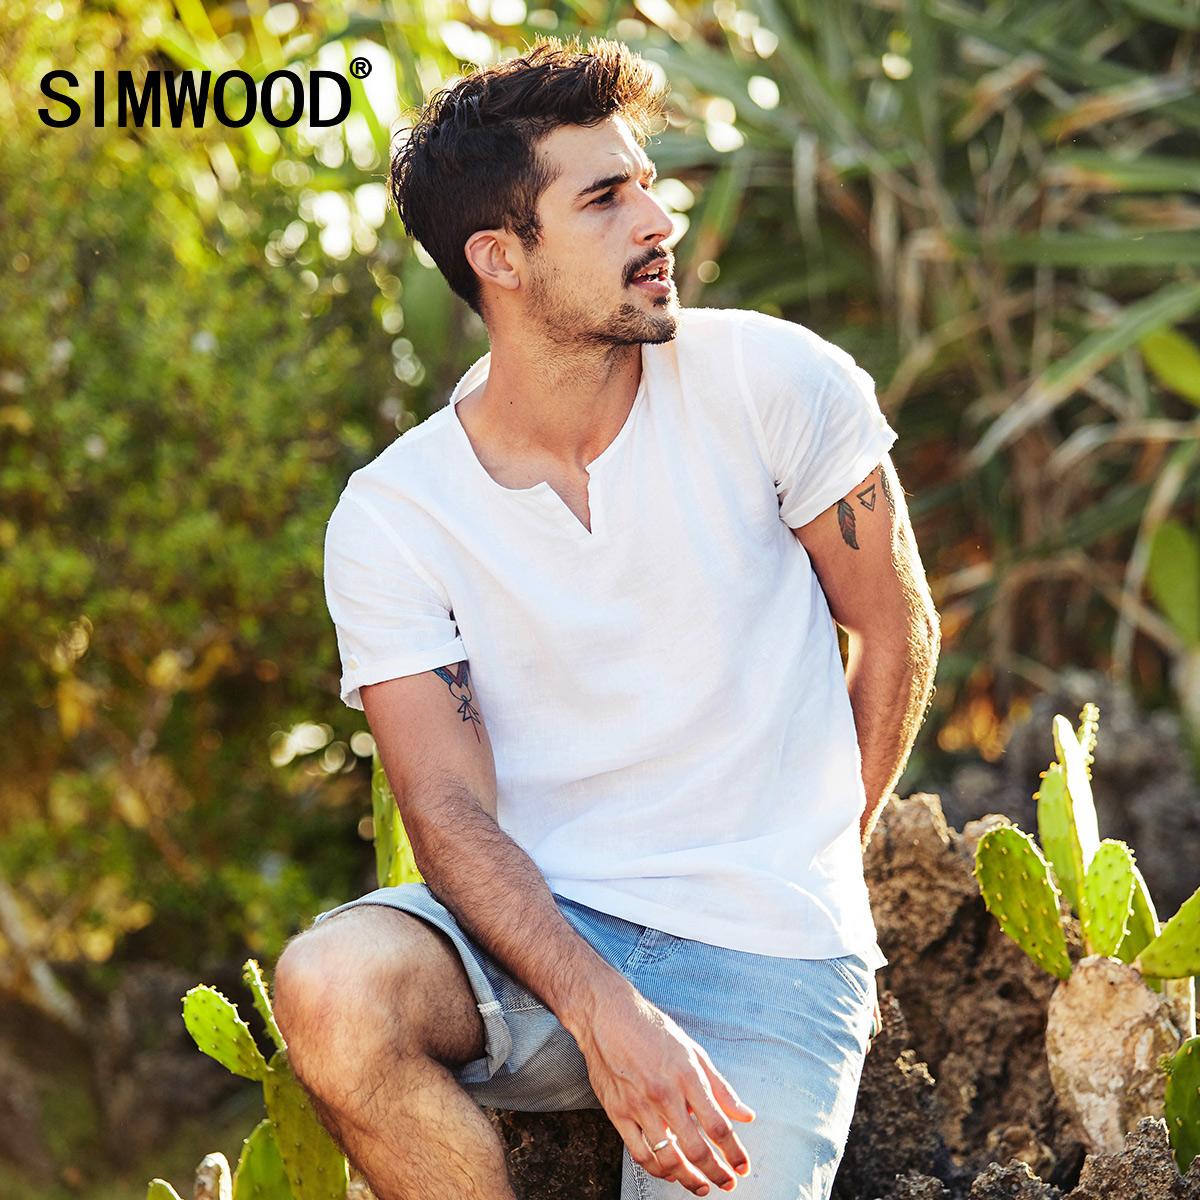 Simwood简木男装夏季新款简约半开V领亚麻衬衣修身薄款短袖衬衫男